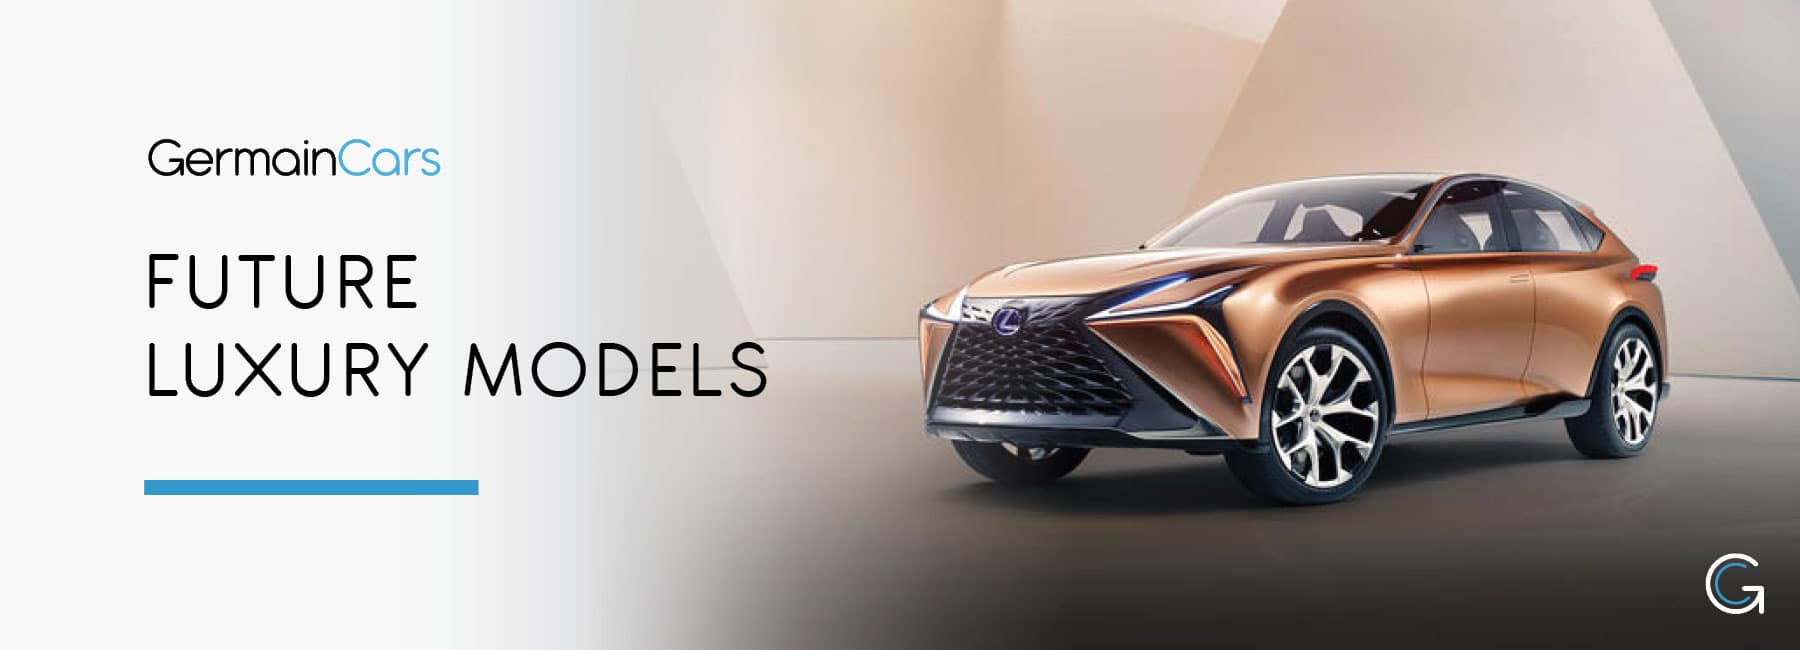 Future Luxury Models